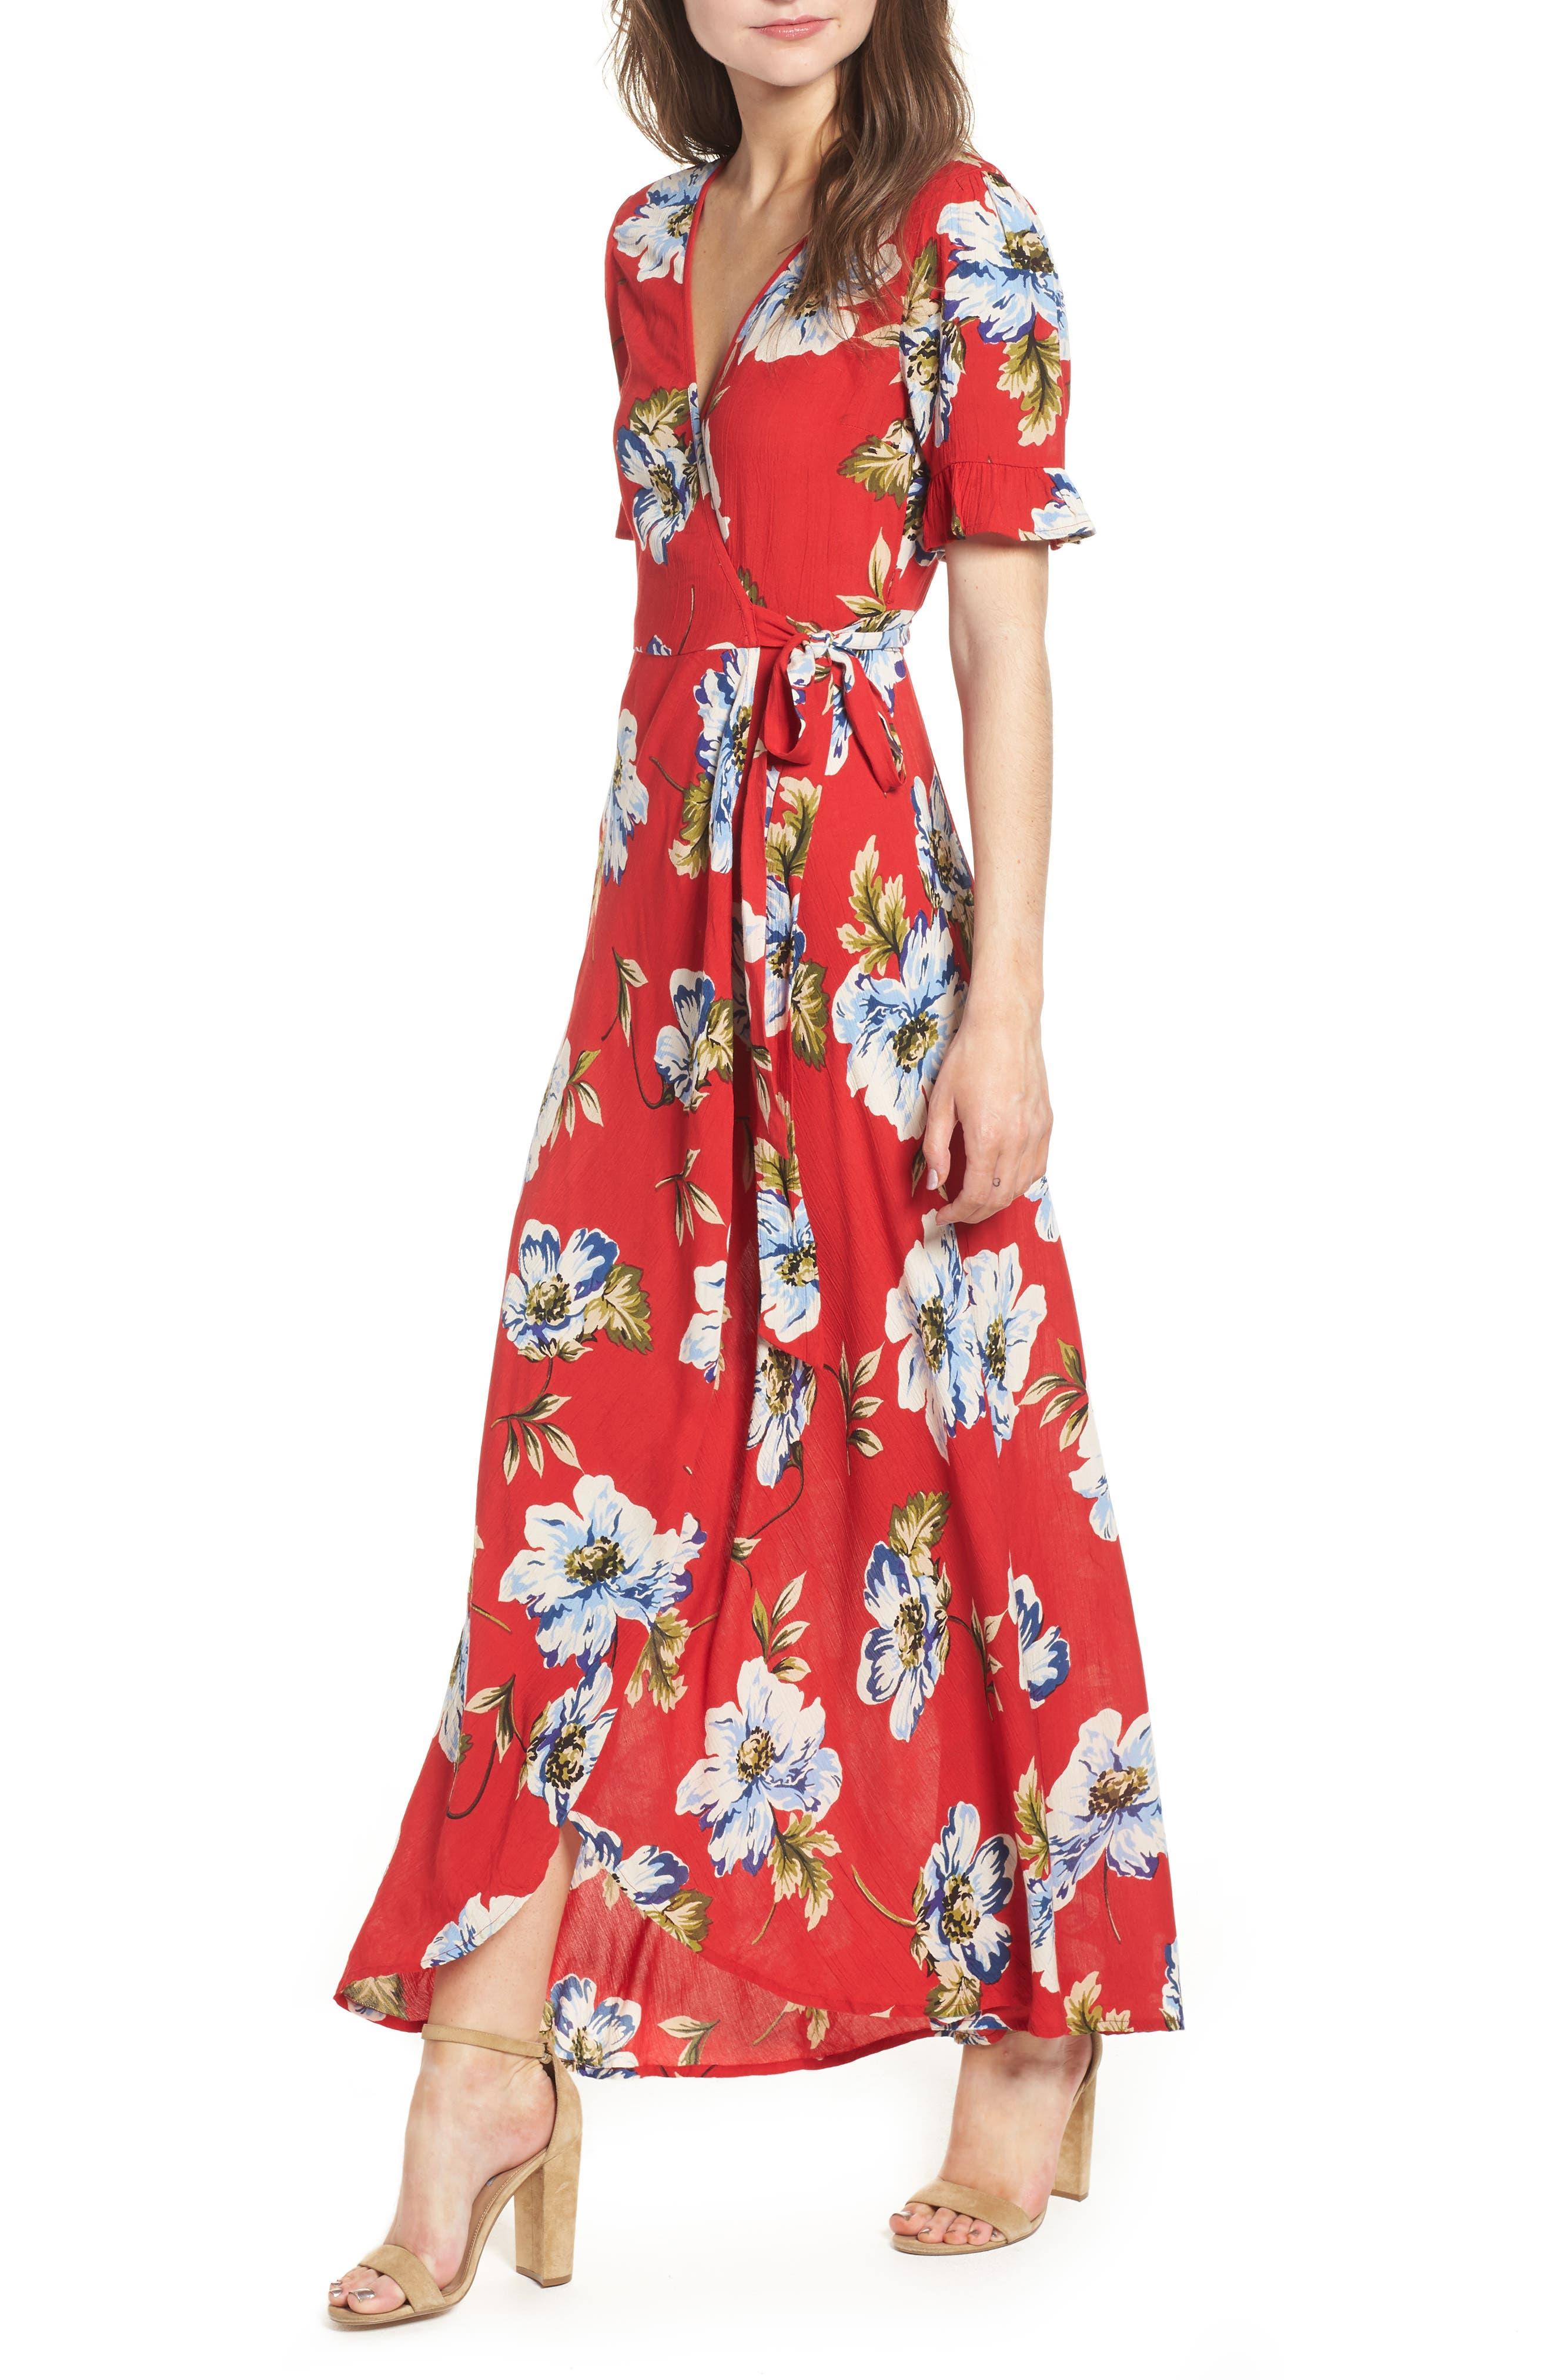 Blue Moon Floral Print Wrap Dress,                             Main thumbnail 1, color,                             Red/ Sky